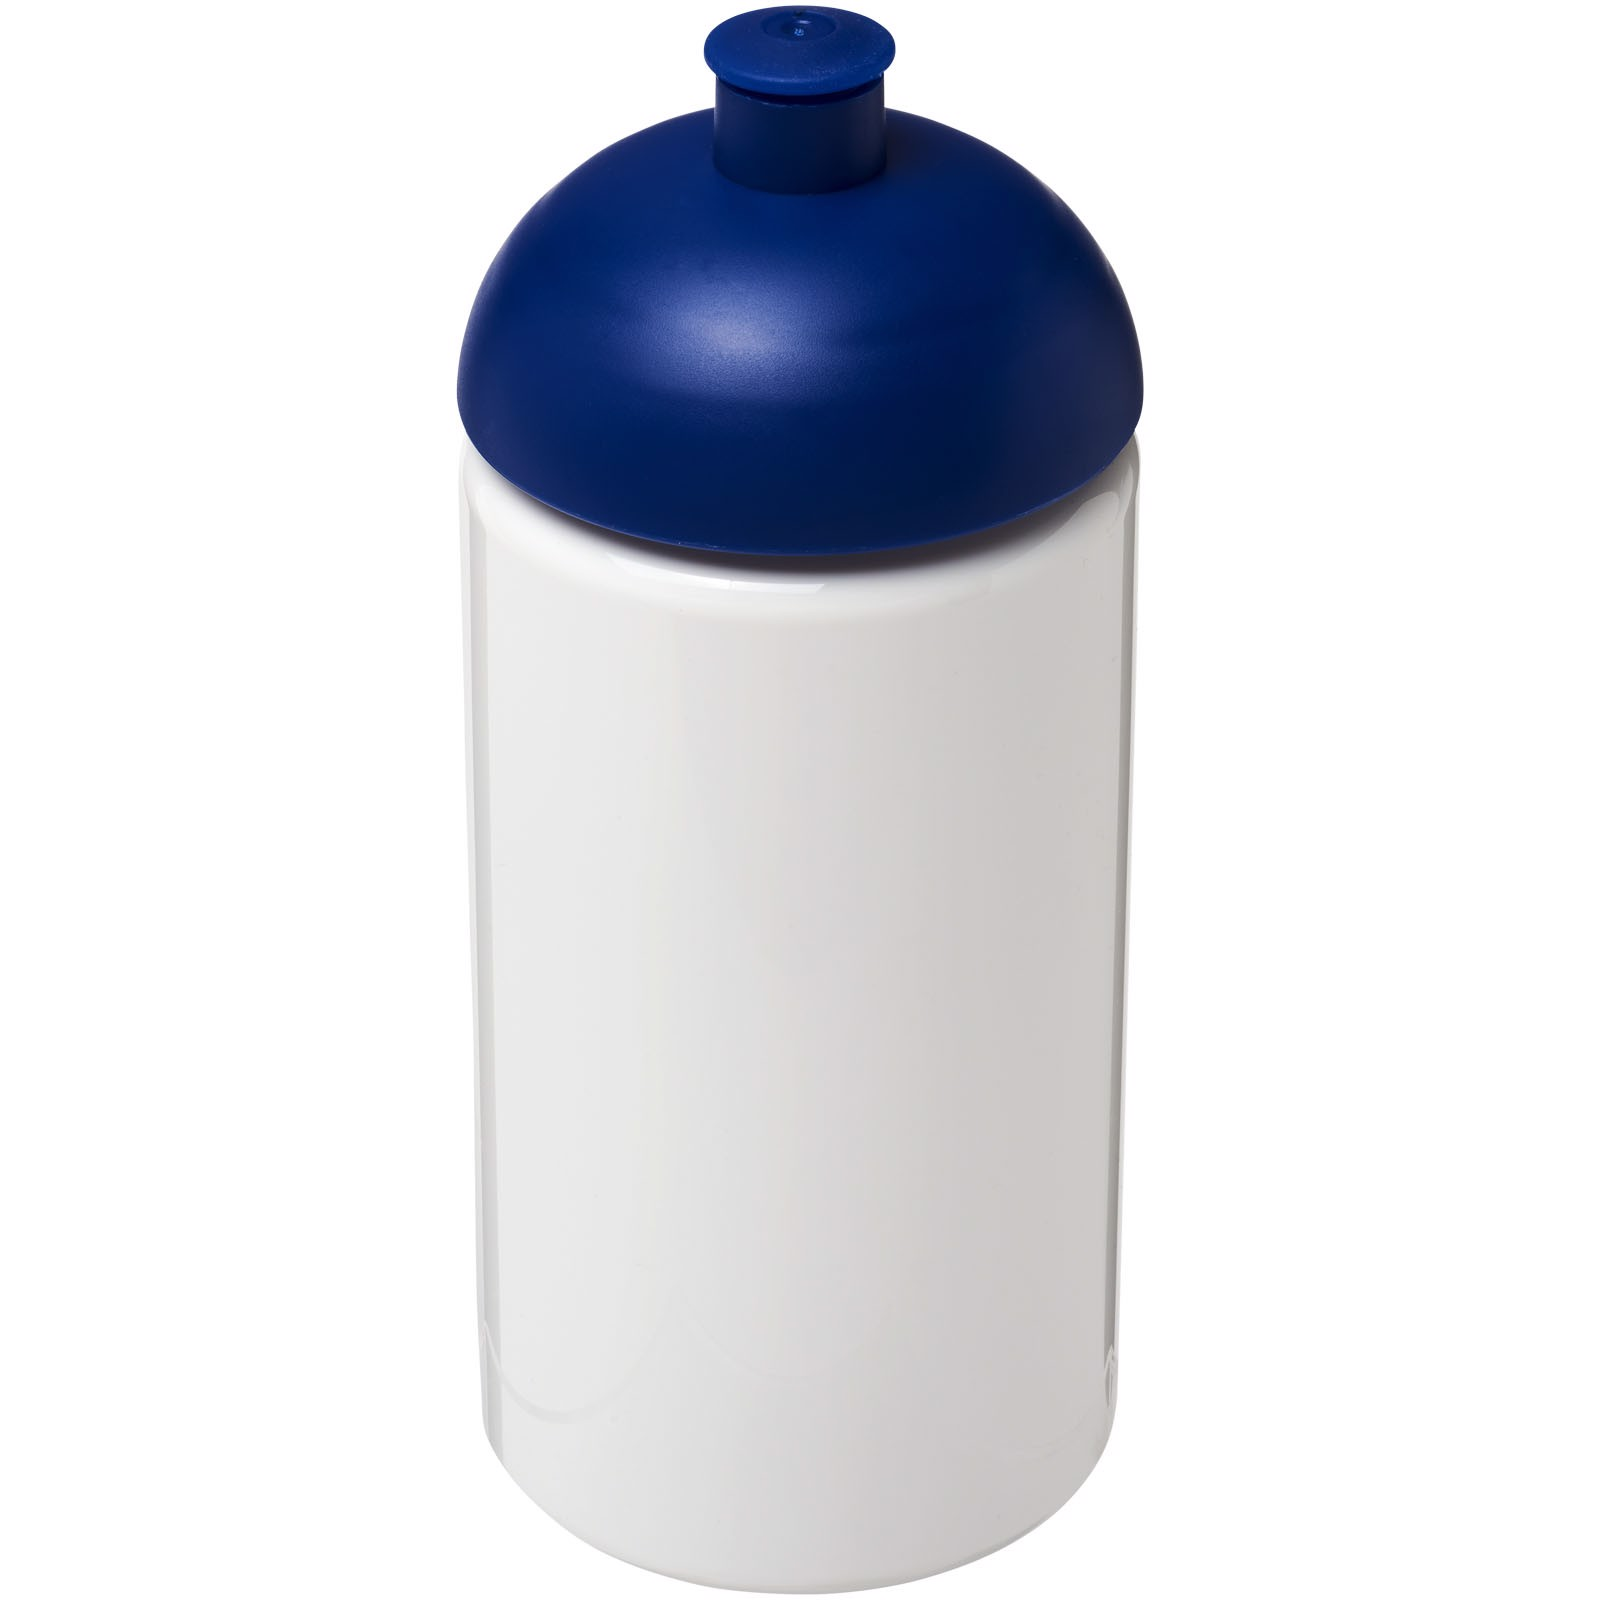 Láhev s kupolovitým víčkem H2O Bop® 500 ml - Bílá / Modrá